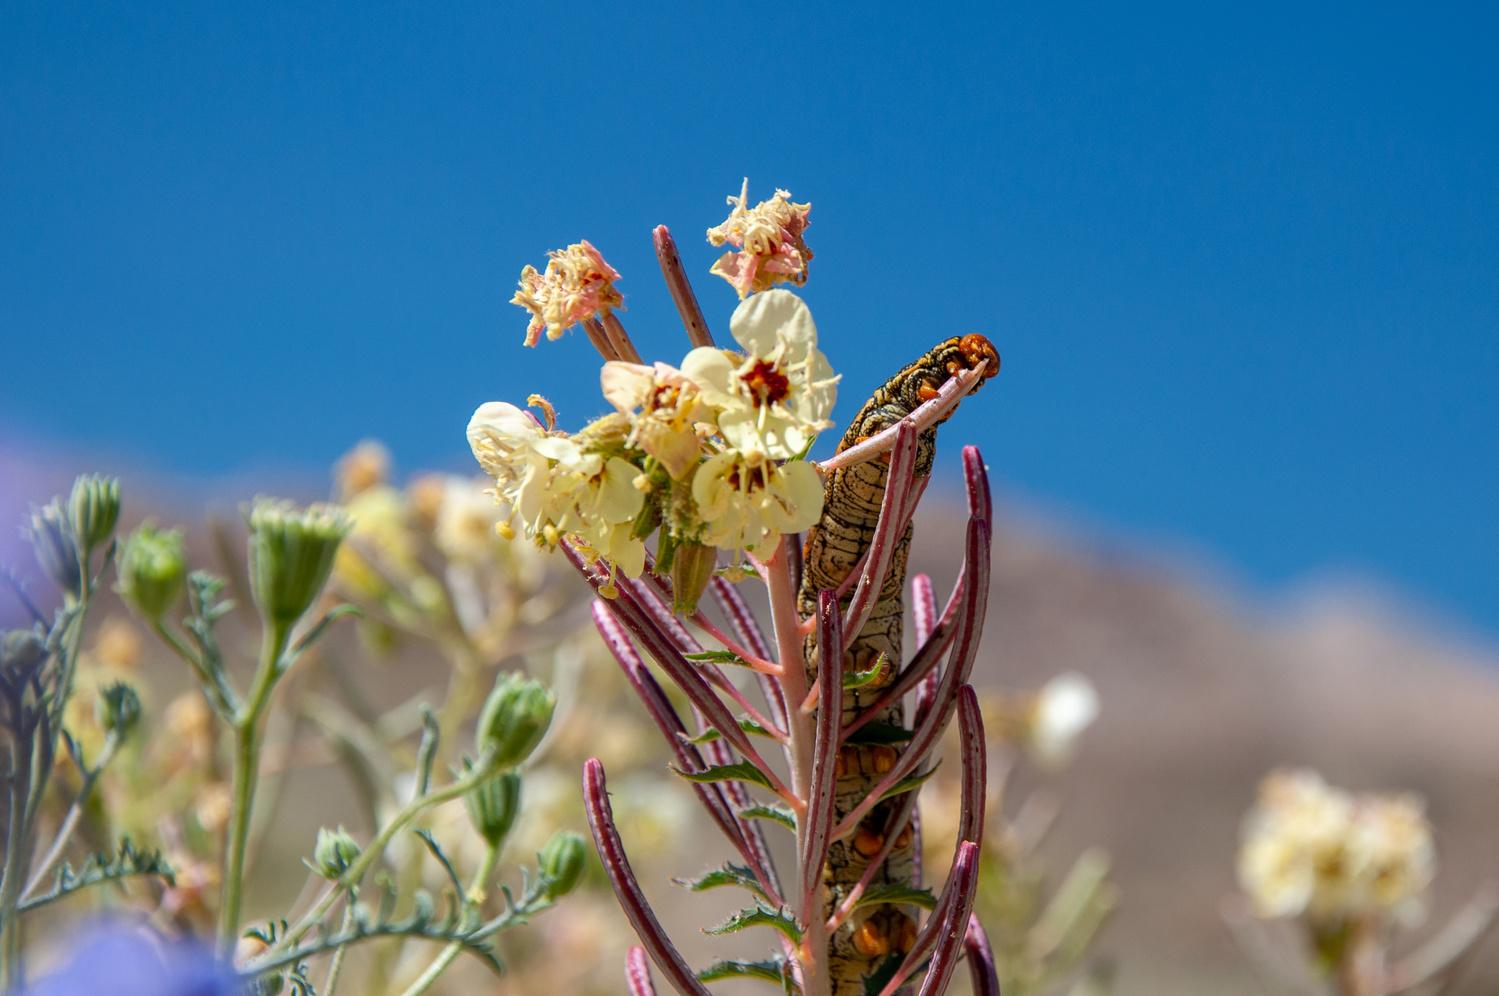 Anza Borrego Desert Catipillar by Josh Utley